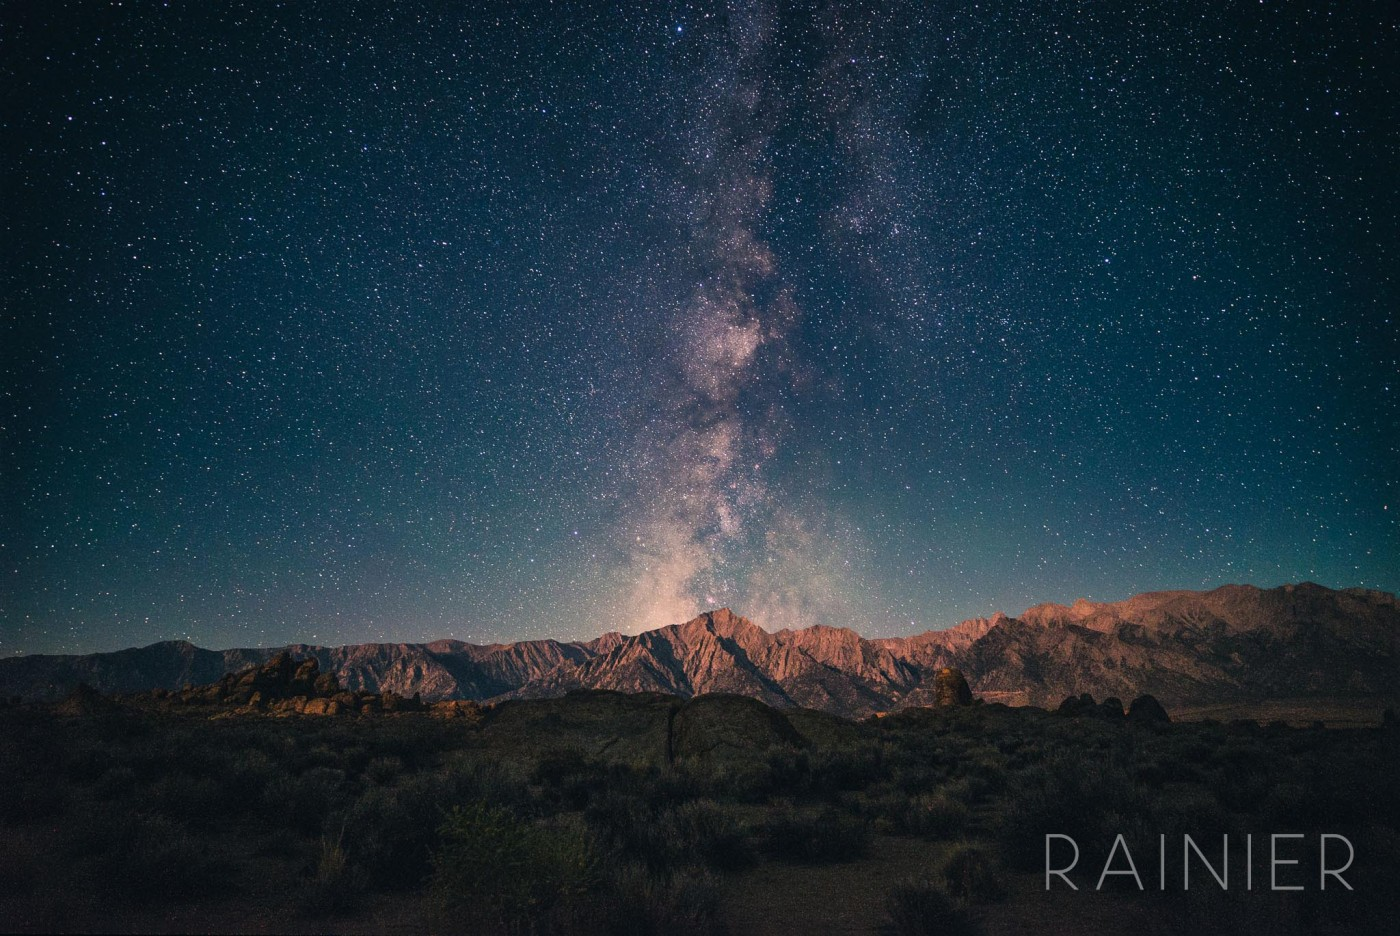 rainier-milky-way-astrophotography-lonely-speck-lightroom-preset-2